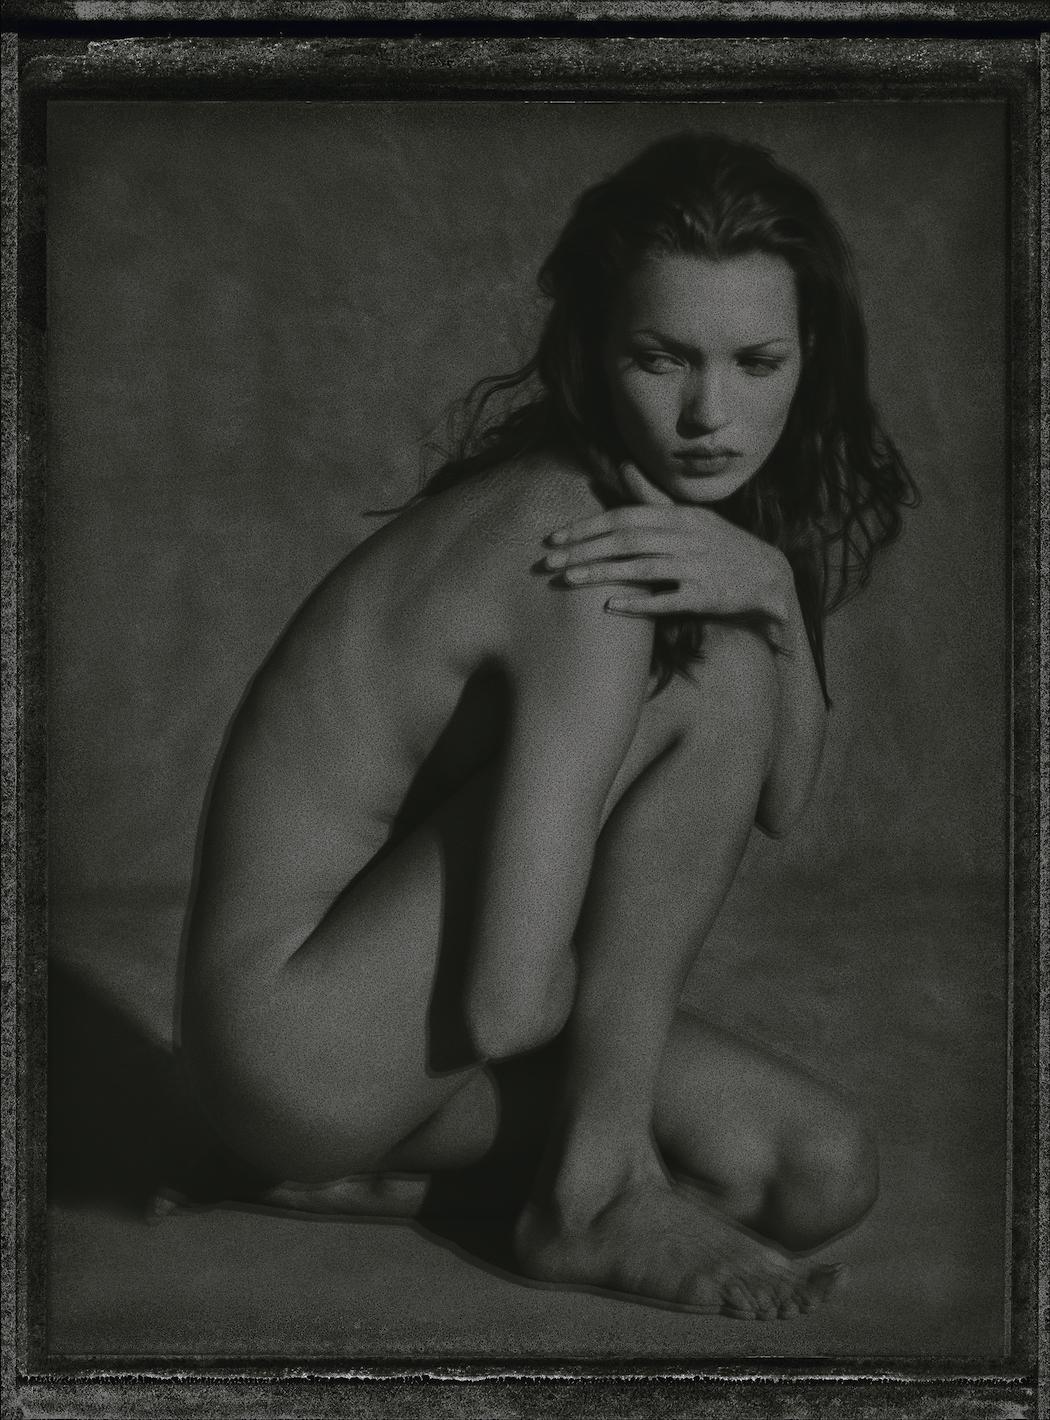 WATSON_Kate-Moss_Marrakech_1993_polaroid